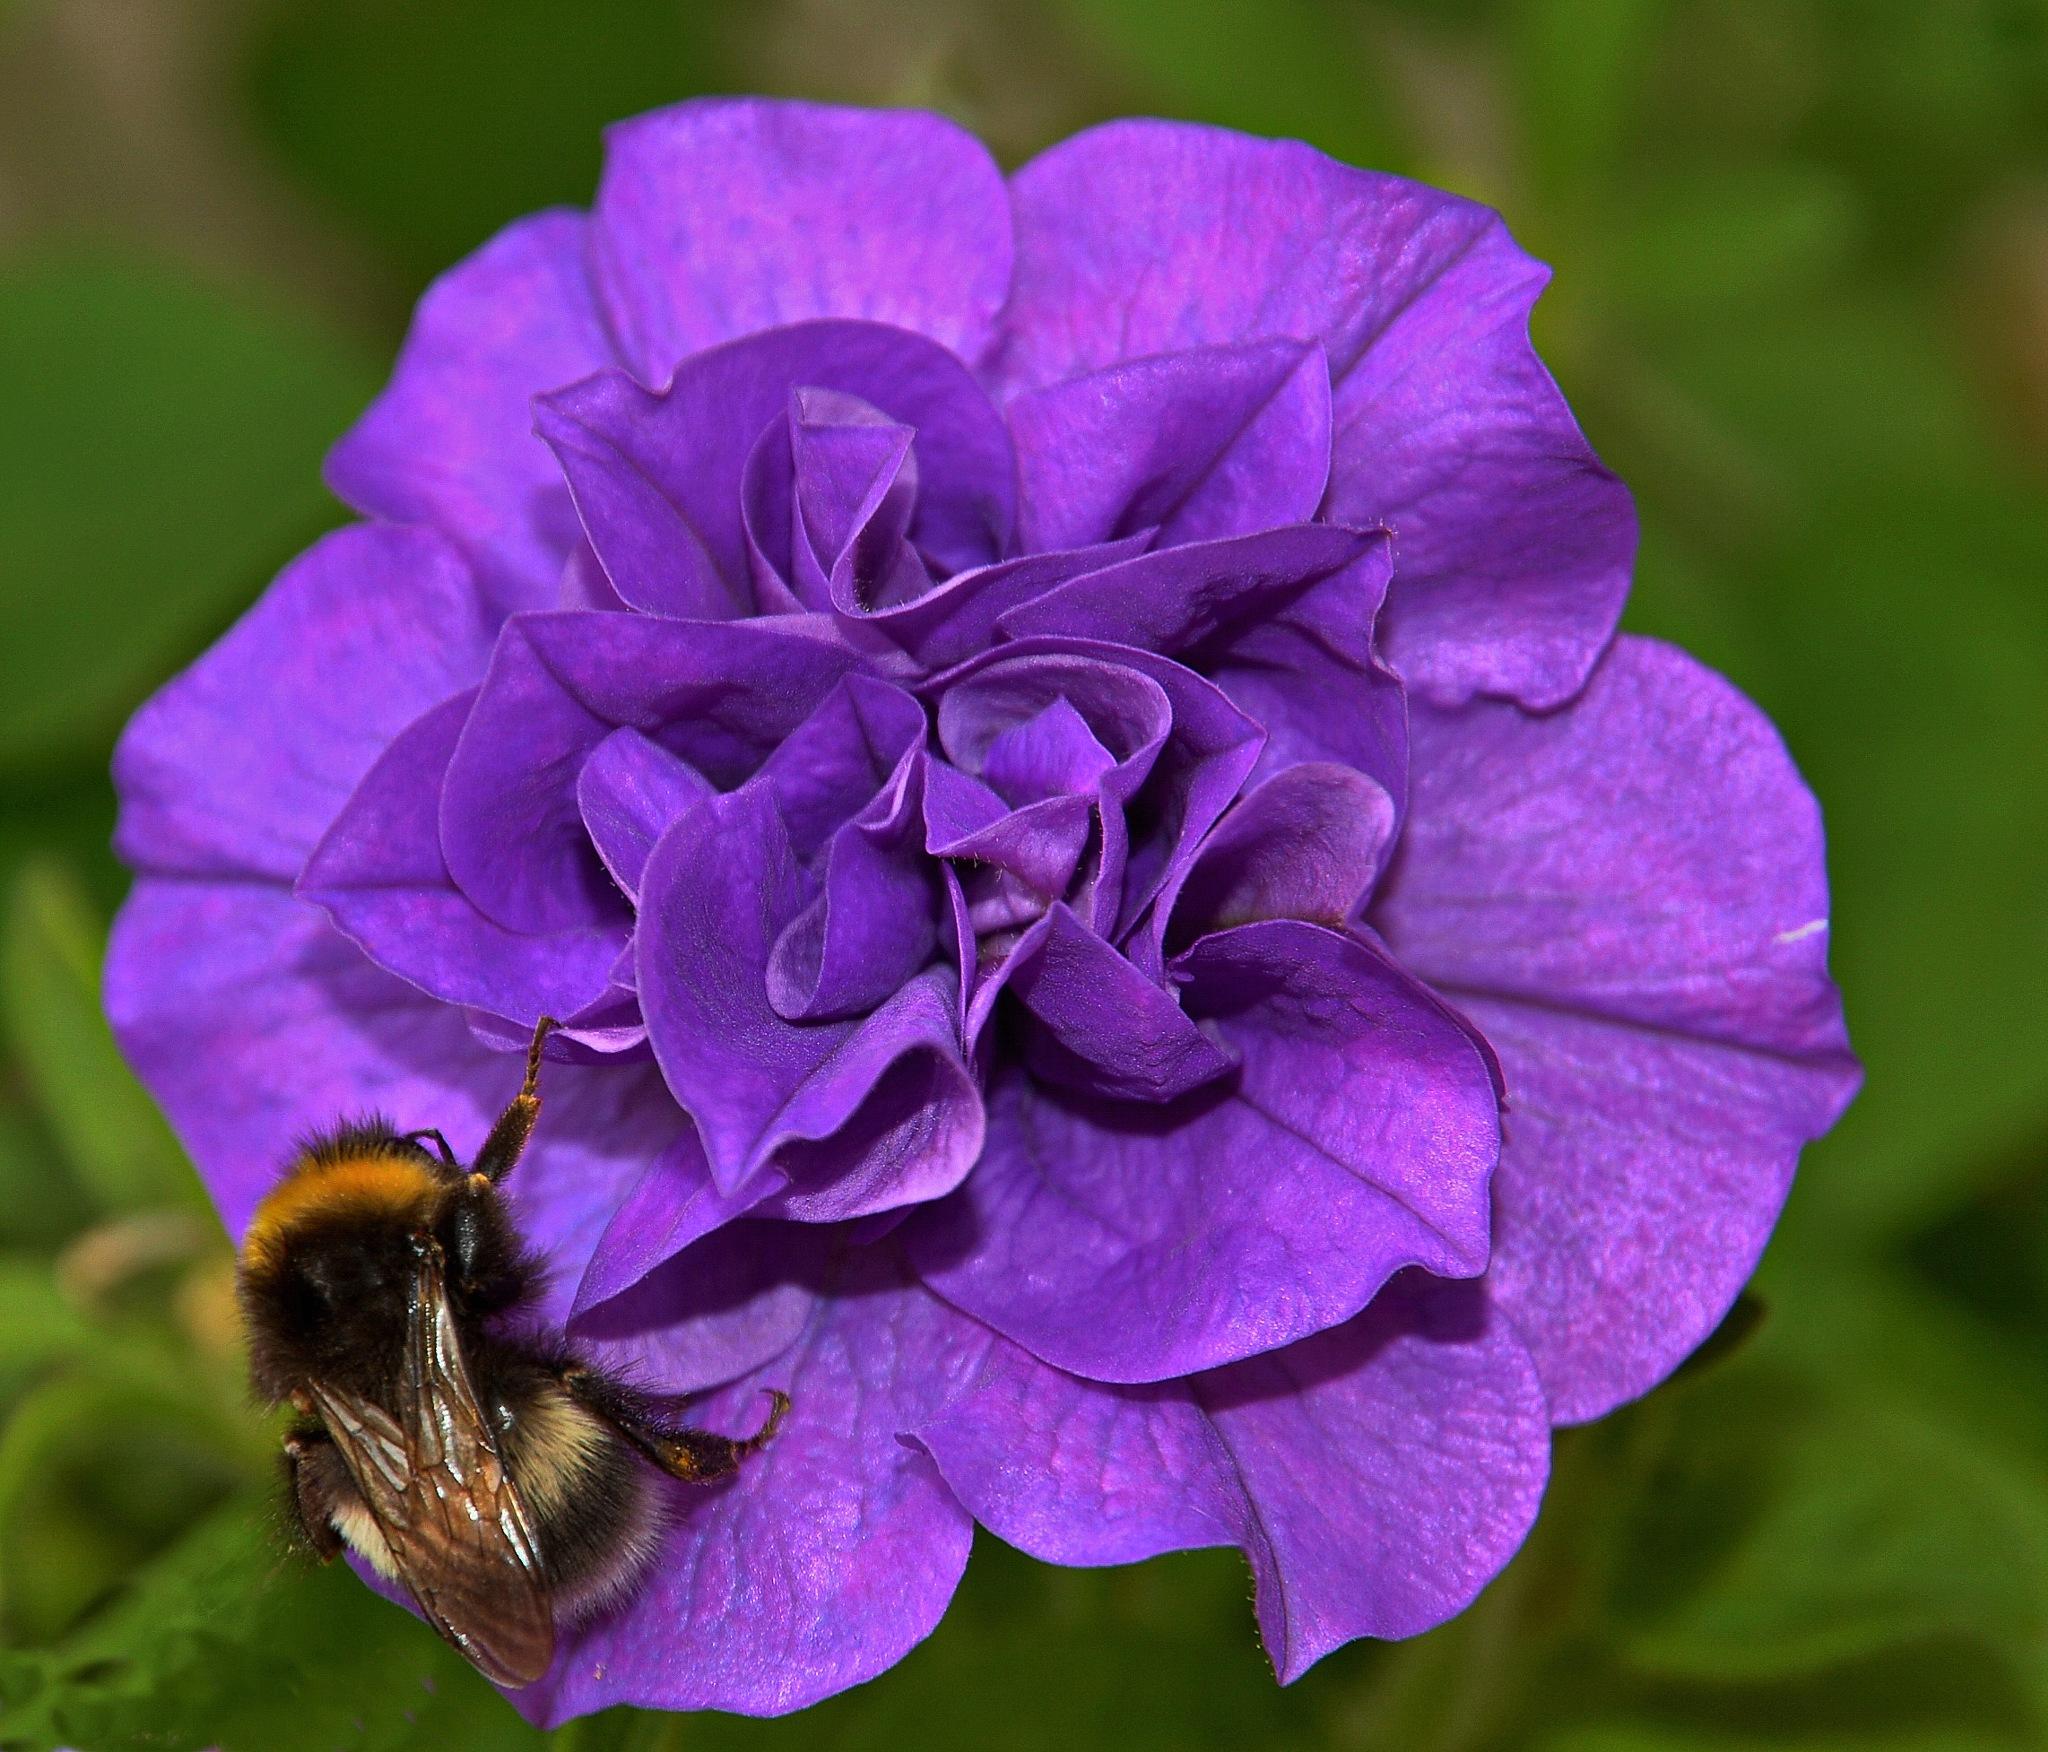 Bumblebee on flower by Per Molvik